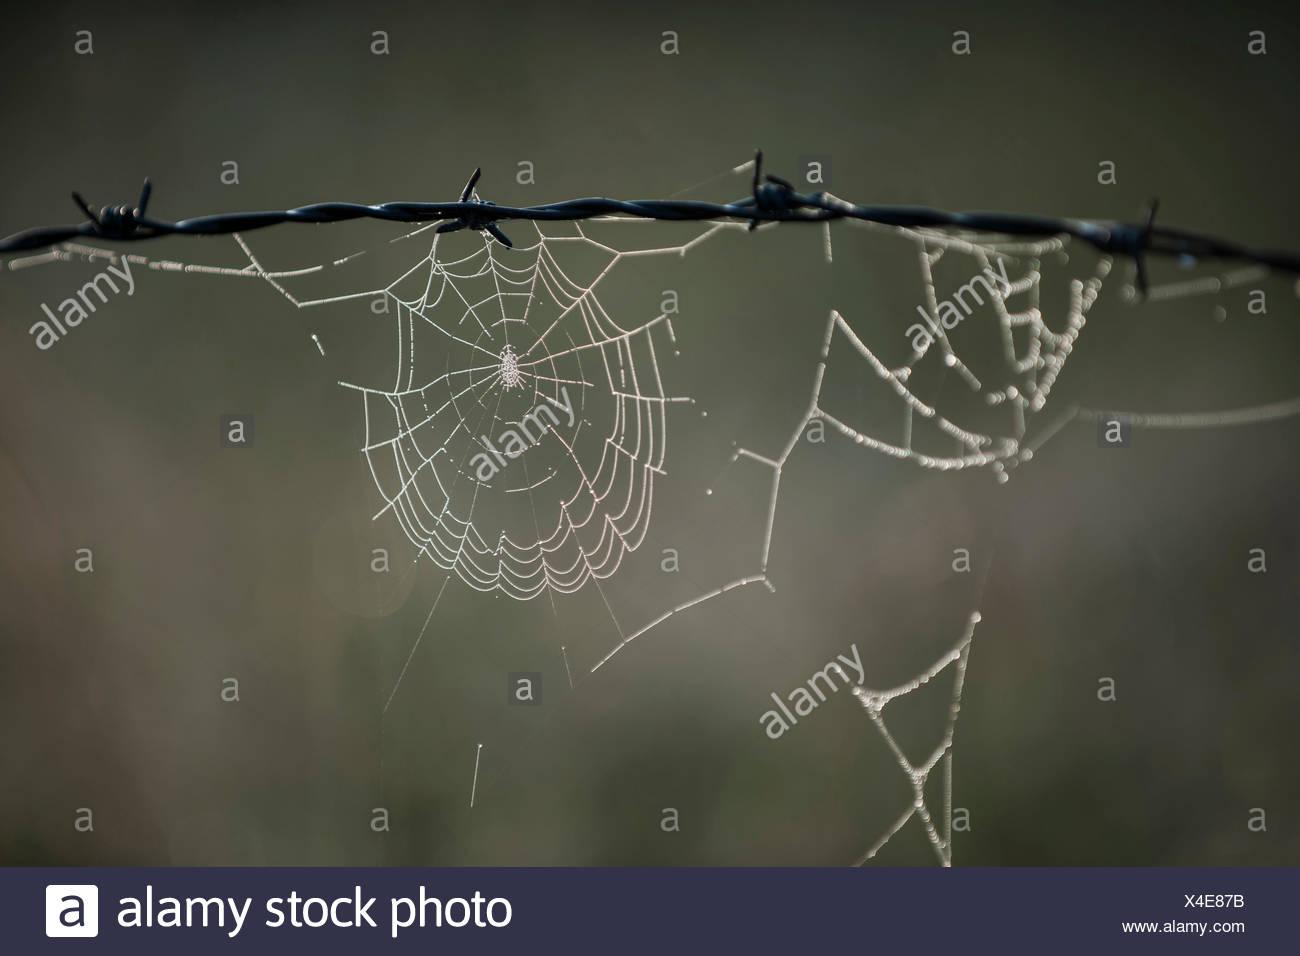 Wire Cobweb Stock Photos & Wire Cobweb Stock Images - Alamy